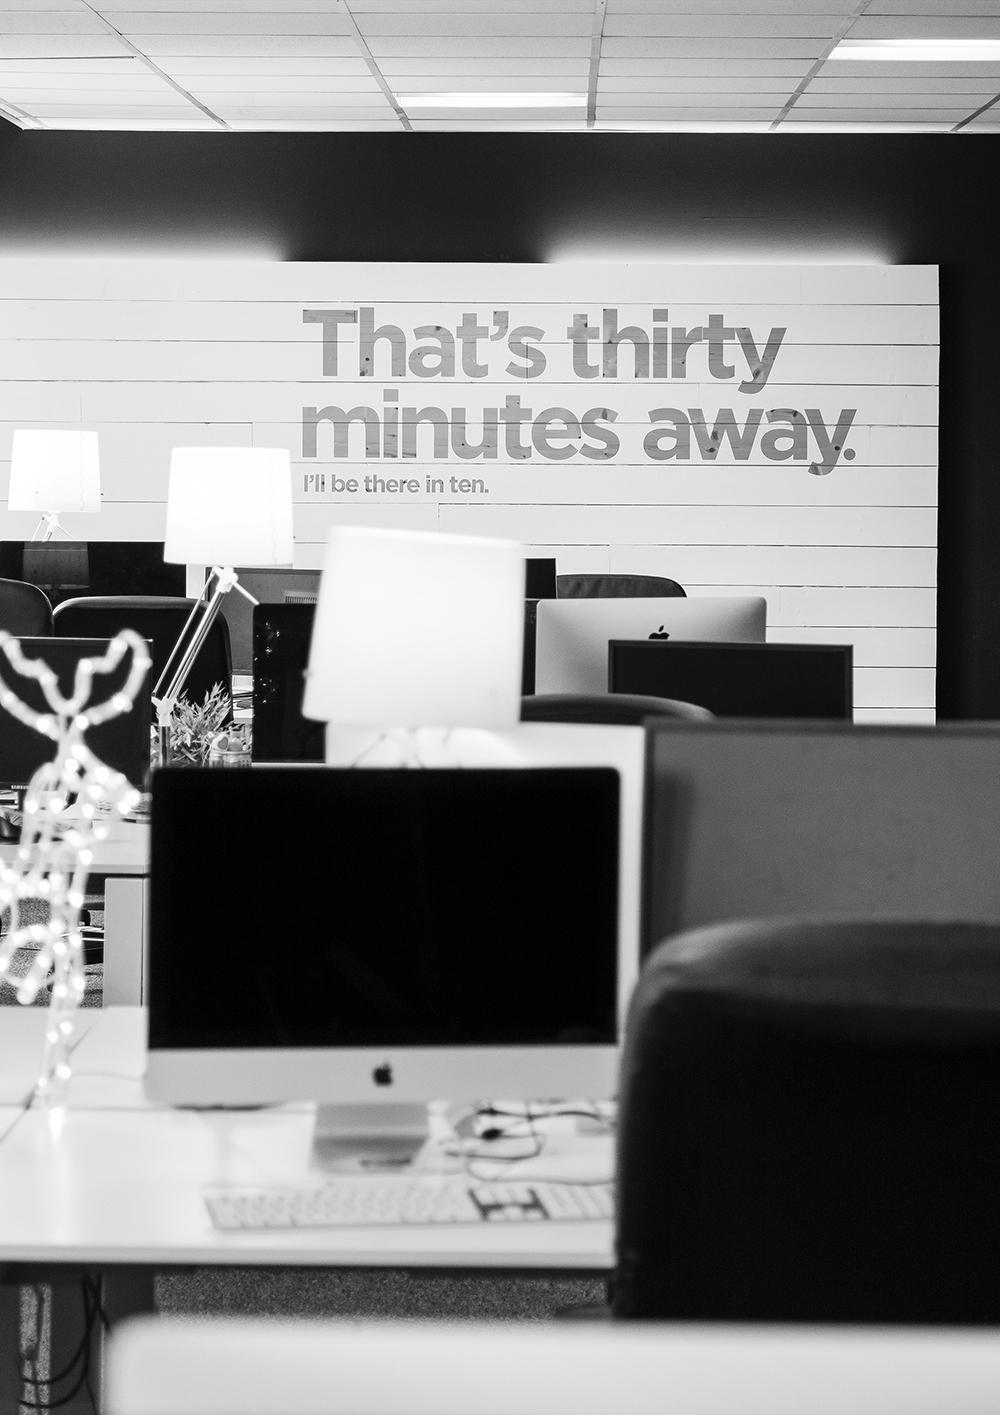 sensio-grey-agence-communication-digital-paris-wpp-grey-europe-brand-as-a-service-thirty-minutes-away